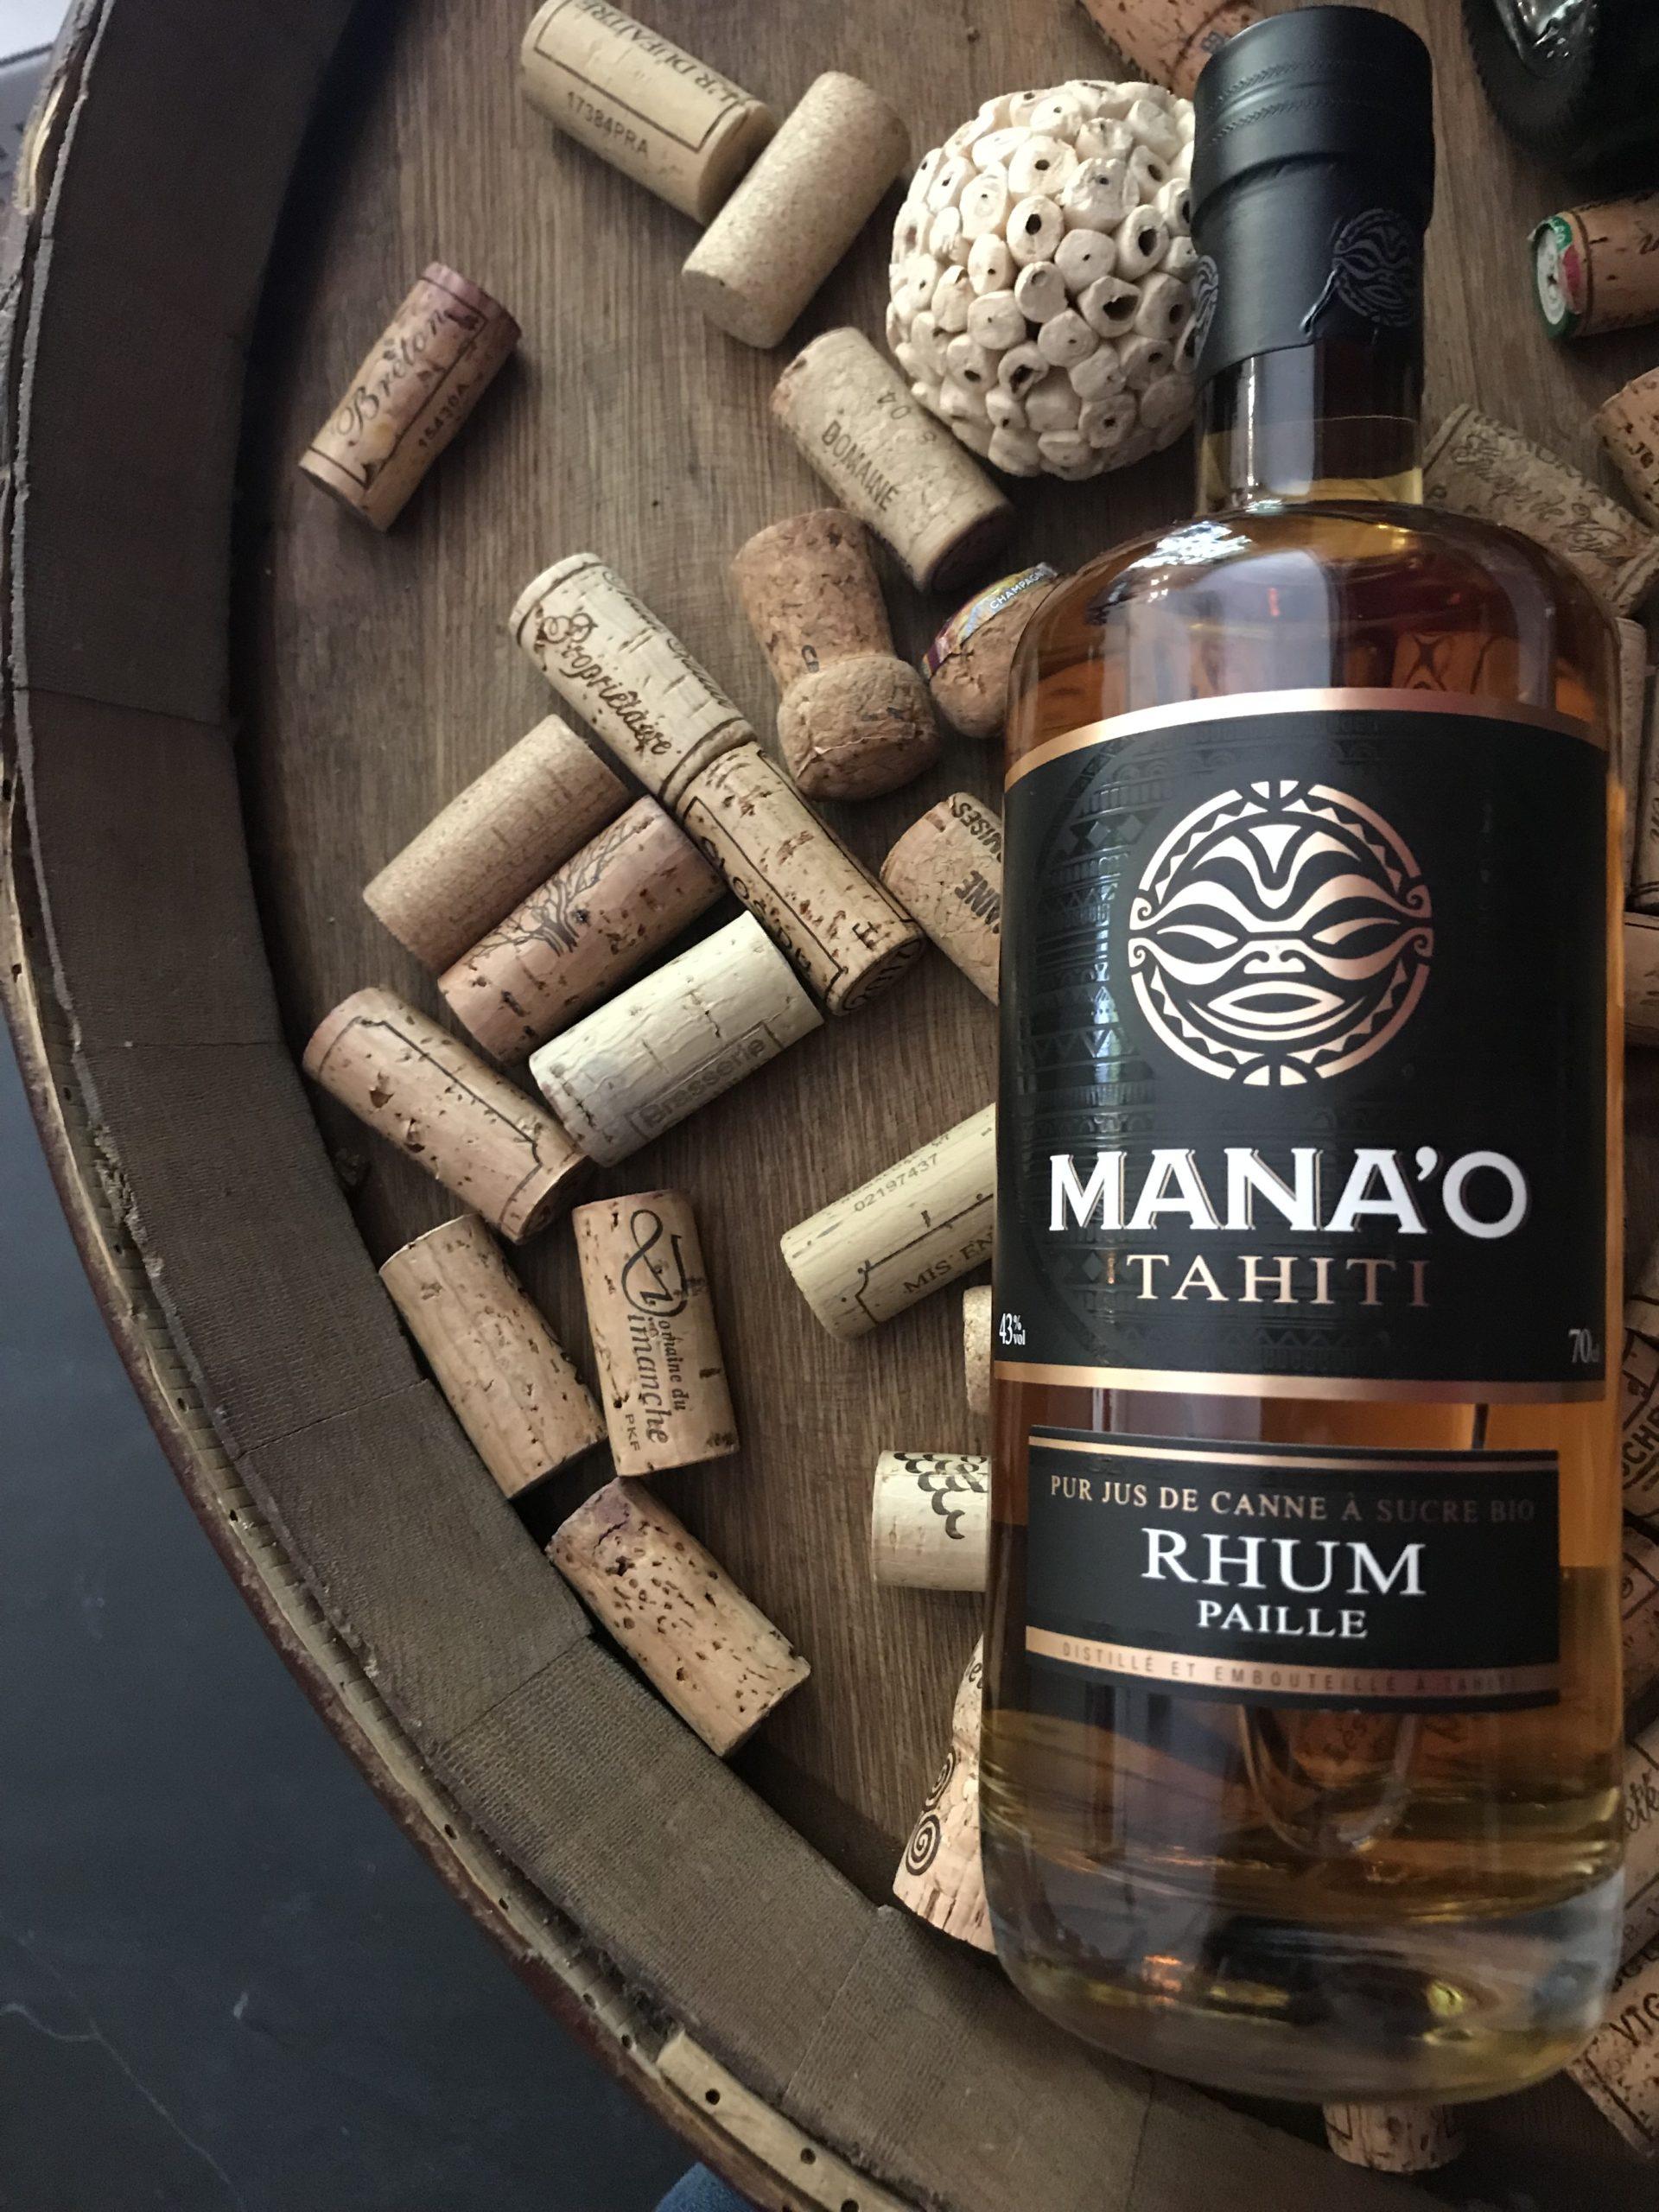 MANAO RHUM PAILLE